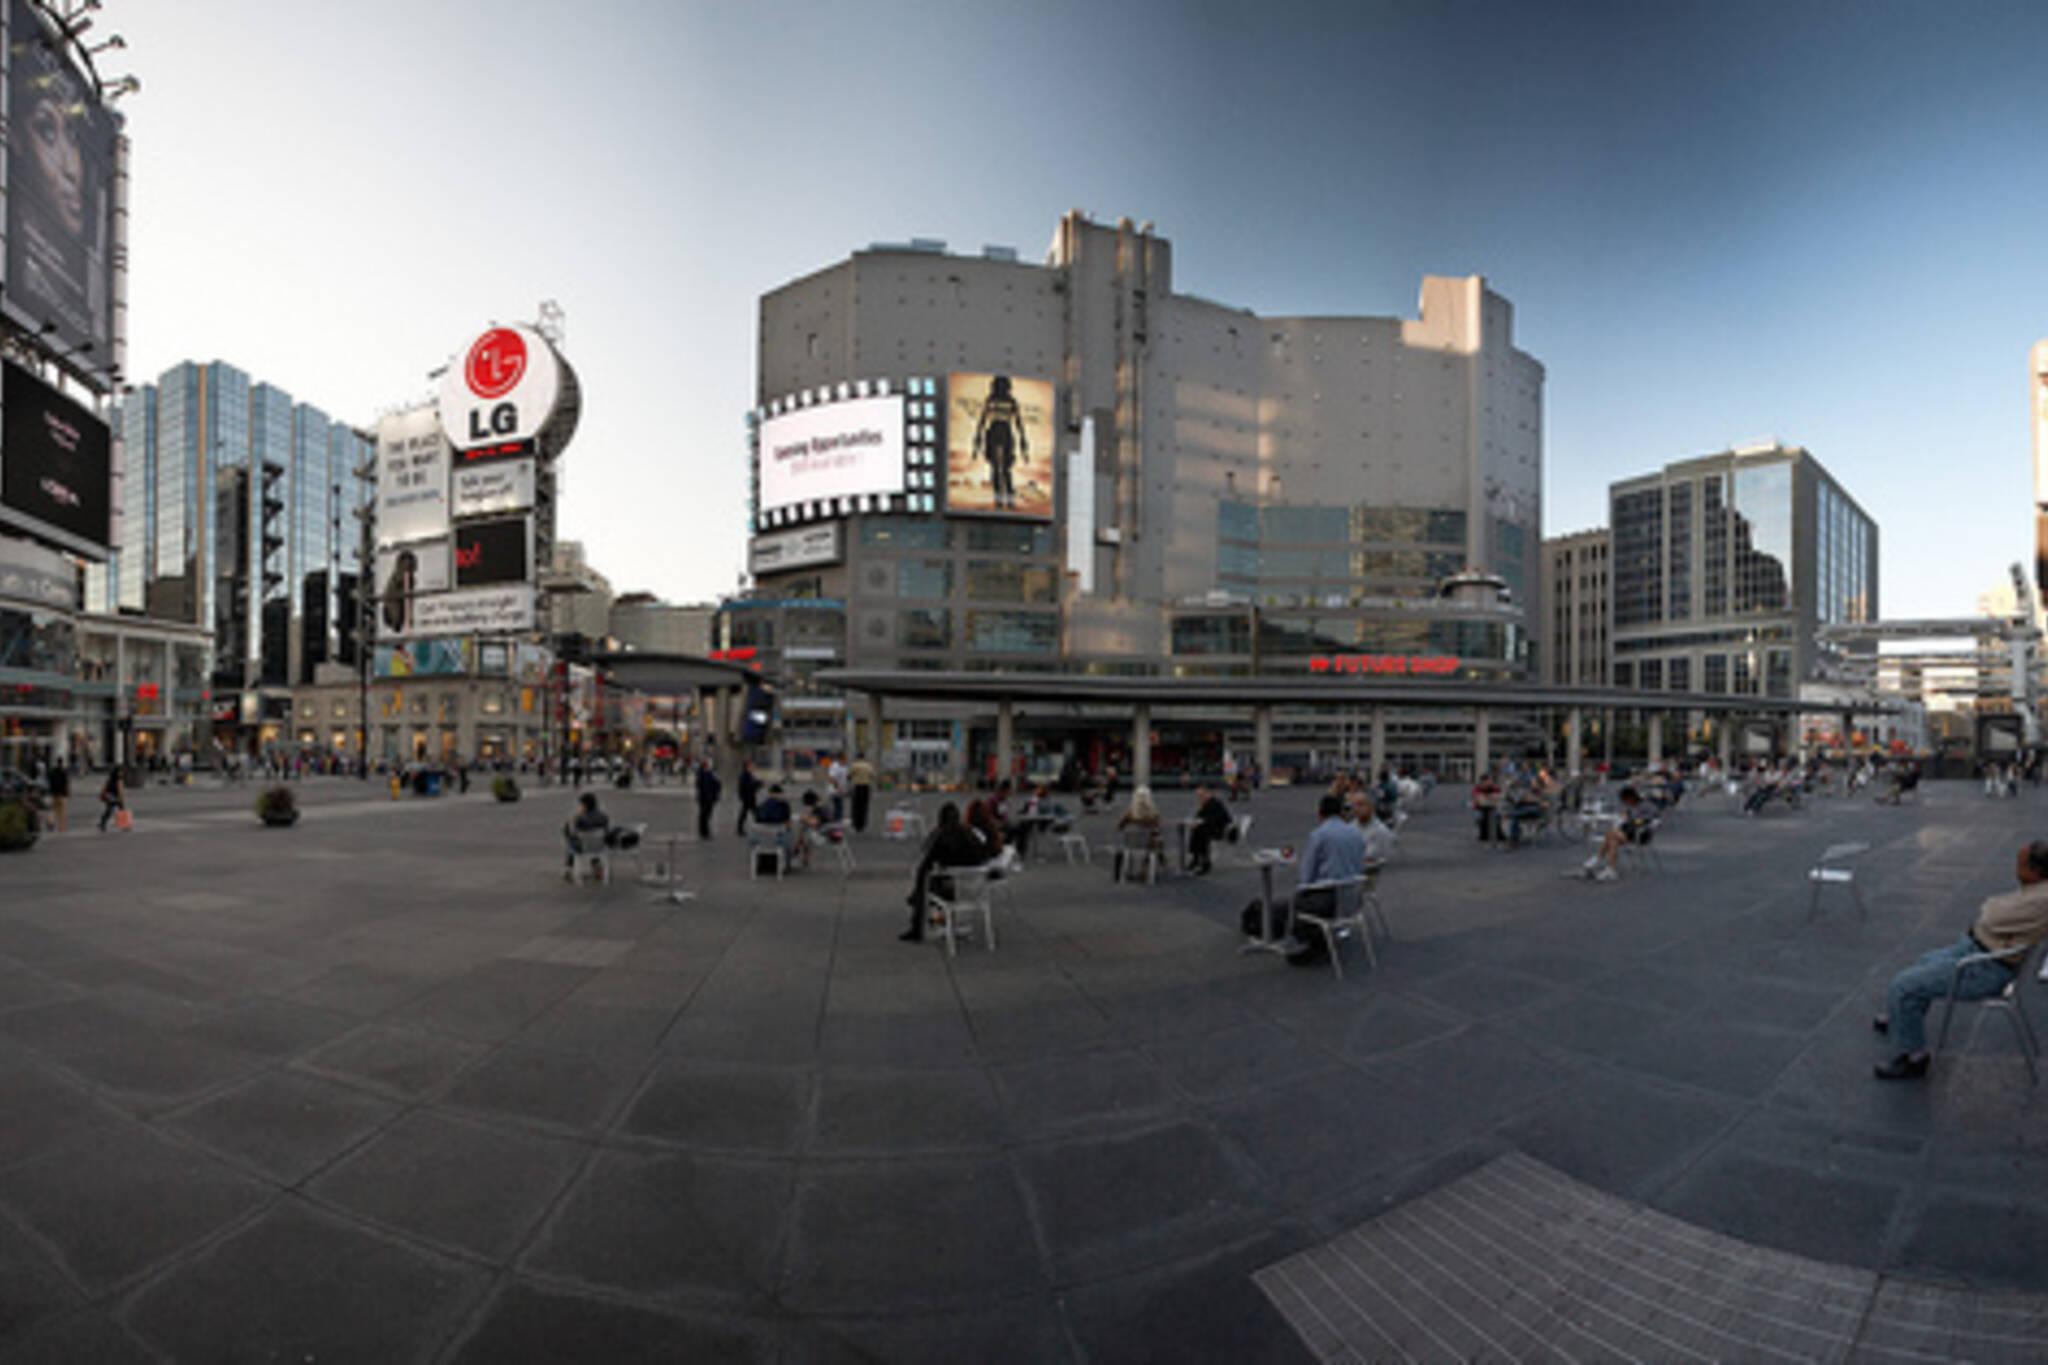 yonge dundas square panorama.jpg